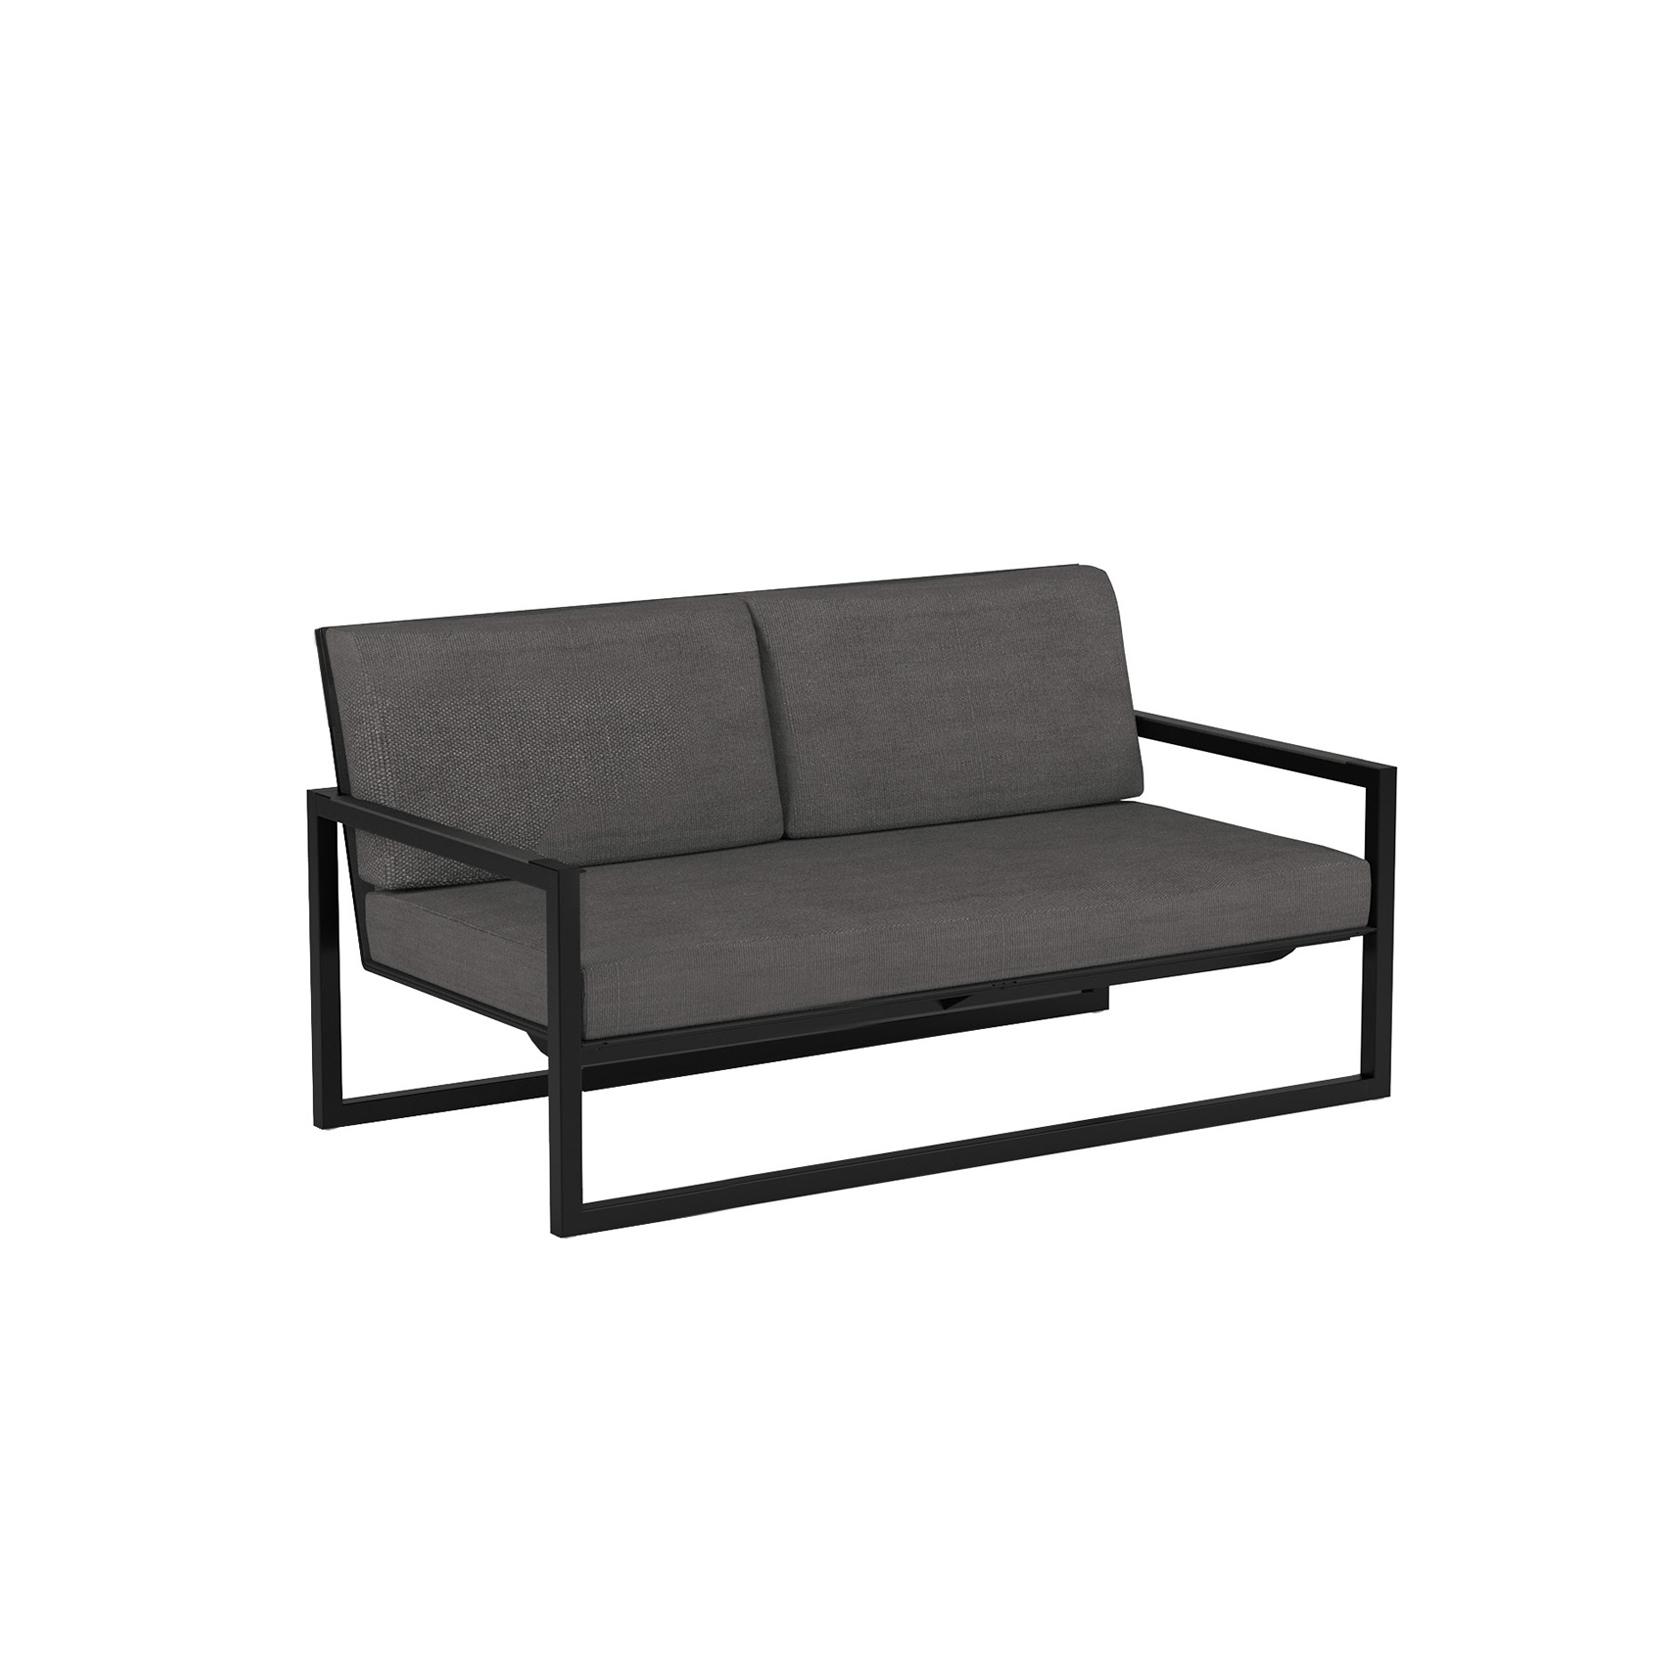 Ninix Lounge Sofa